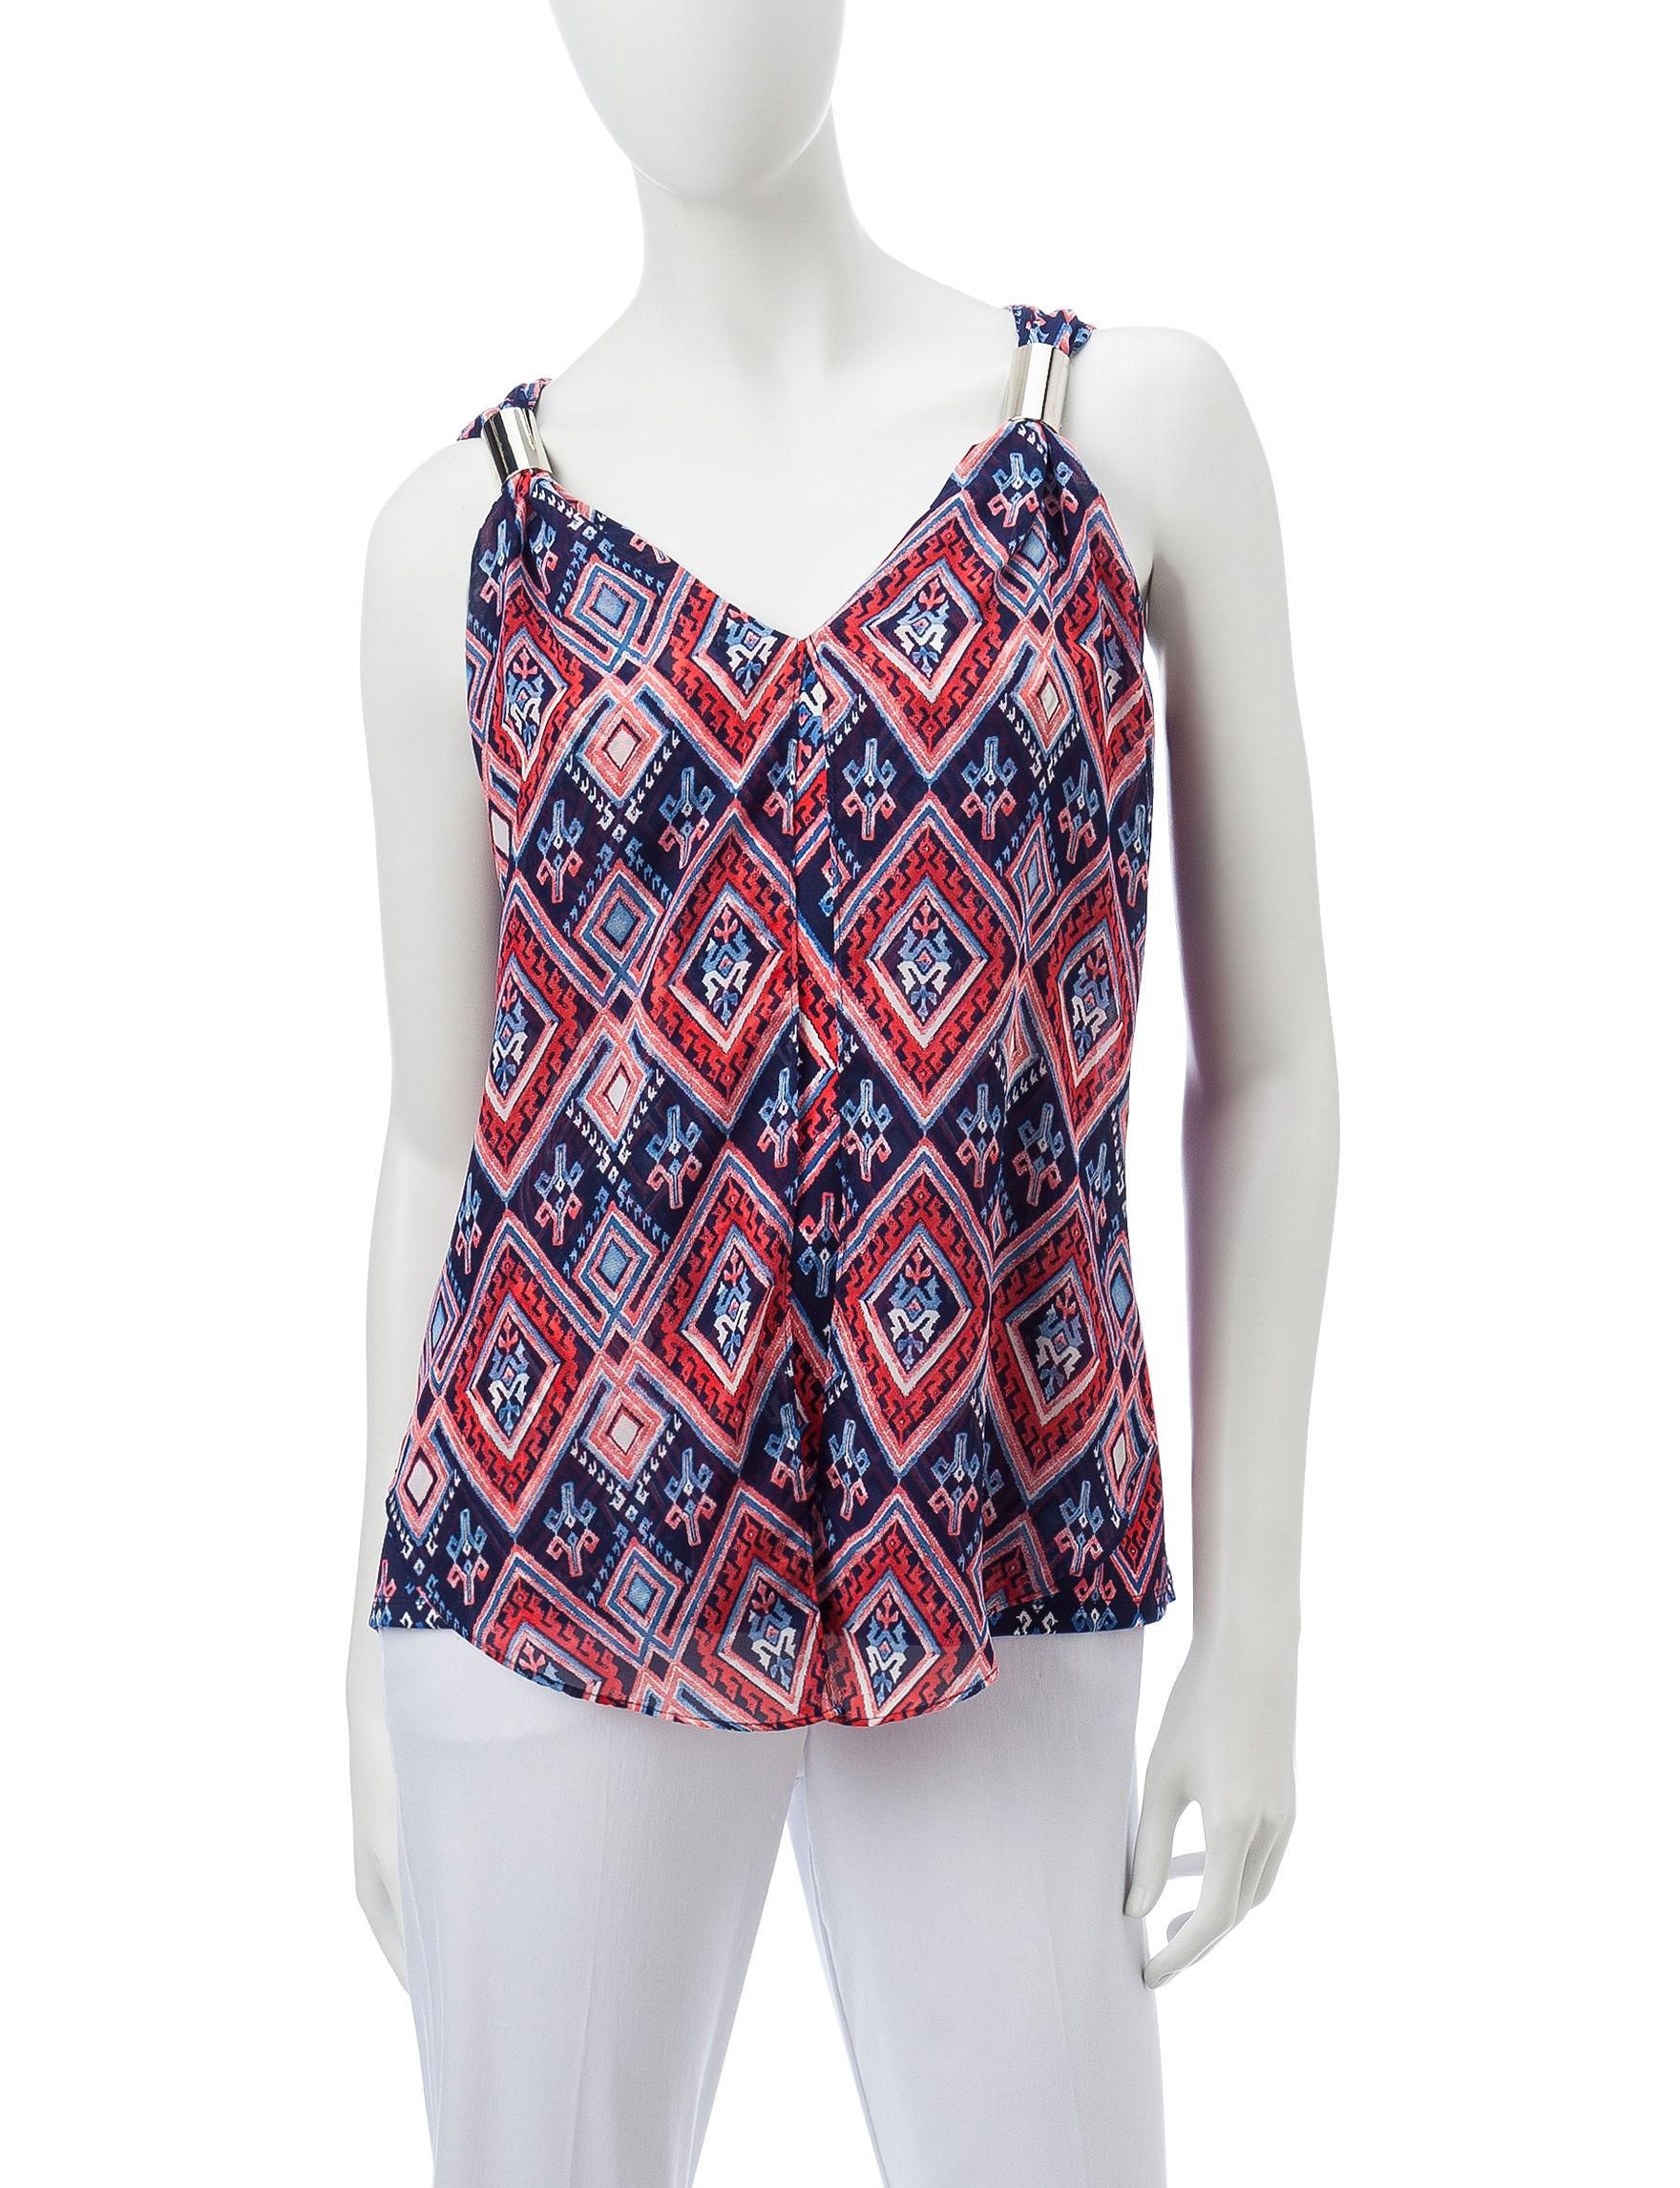 Valerie Stevens Blue Multi Camisoles & Tanks Shirts & Blouses